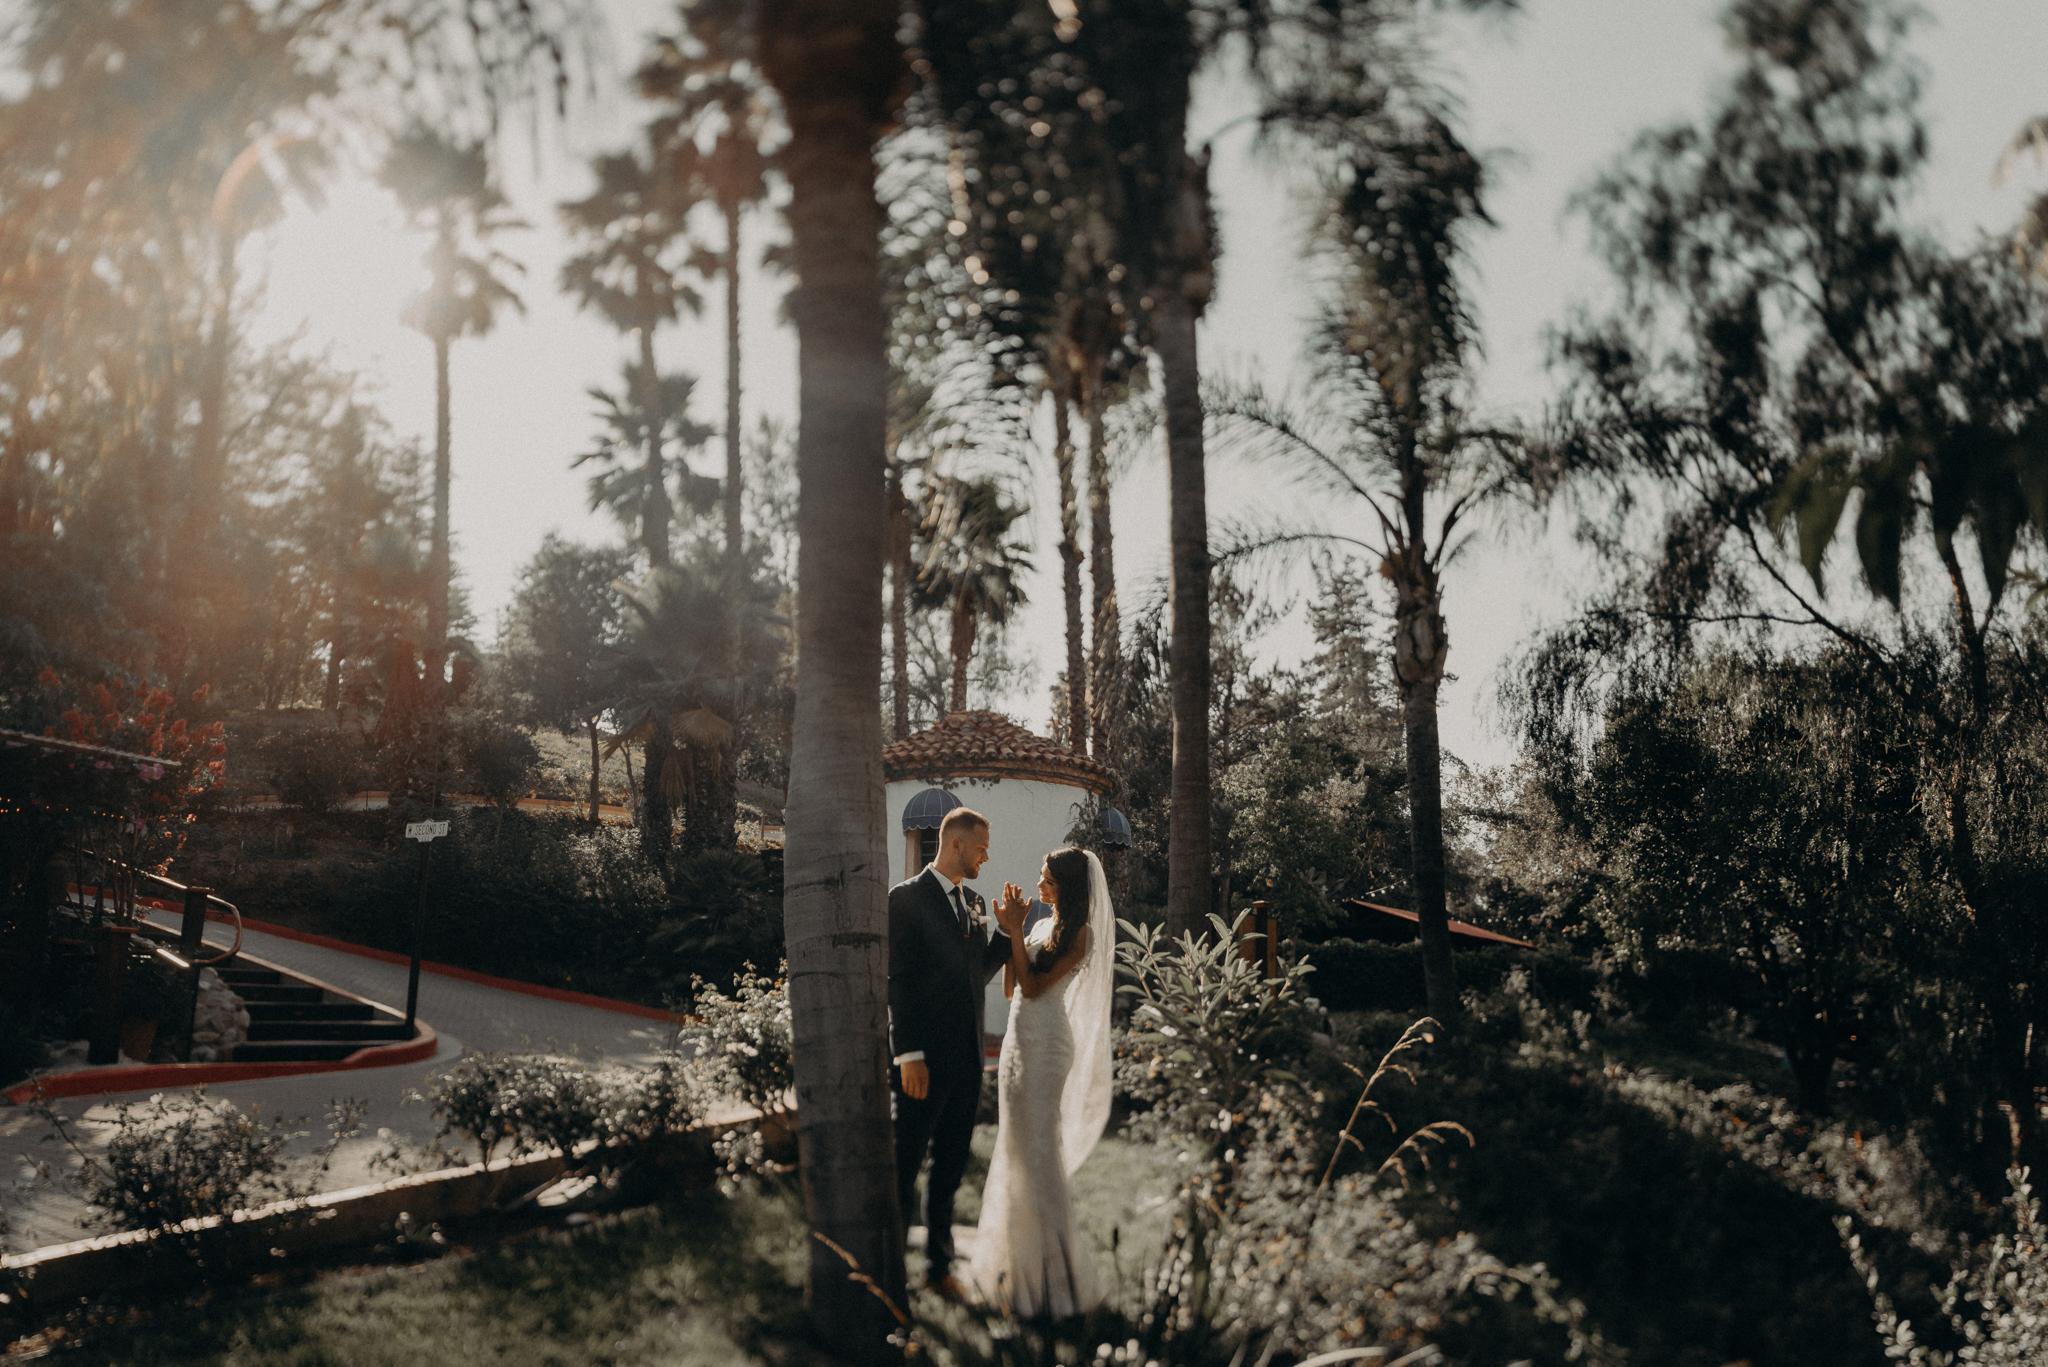 Isaiah + Taylor Photography - Rancho Las Lomas Wedding, Los Angeles Wedding Photographer-091.jpg